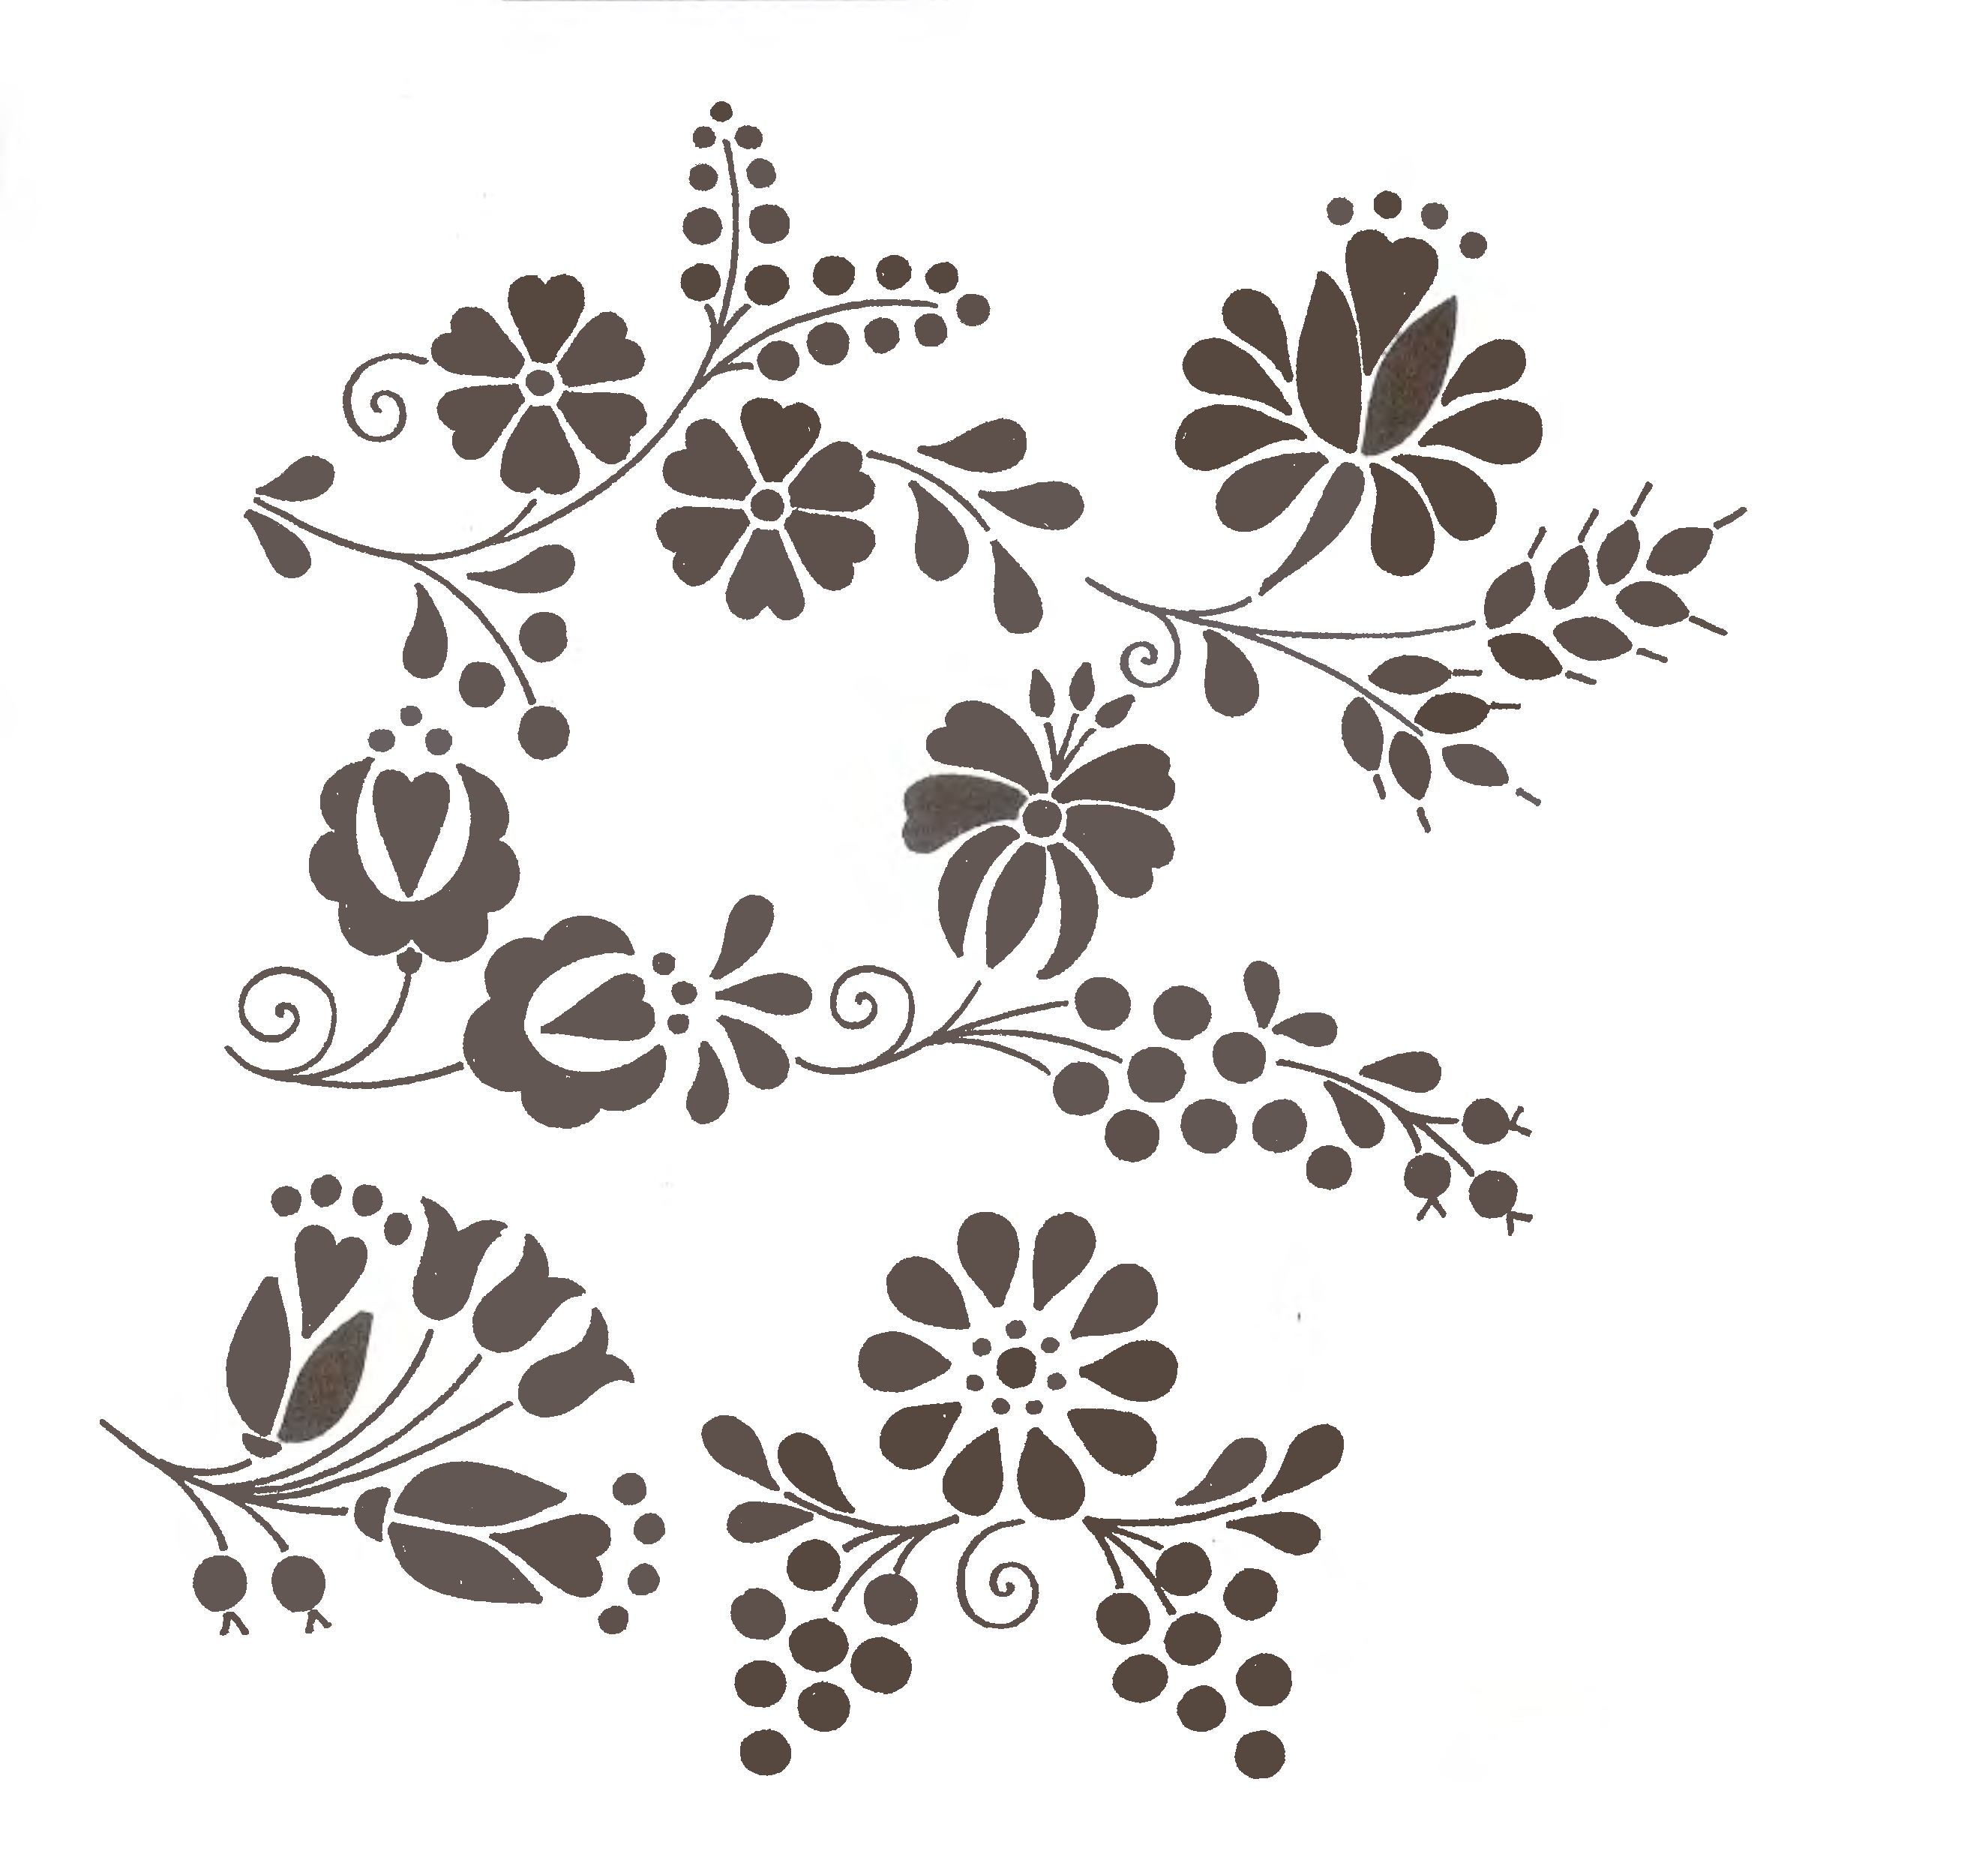 kalocsai | Tejido | Pinterest | Bordado, Patrones y Dibujos para bordar